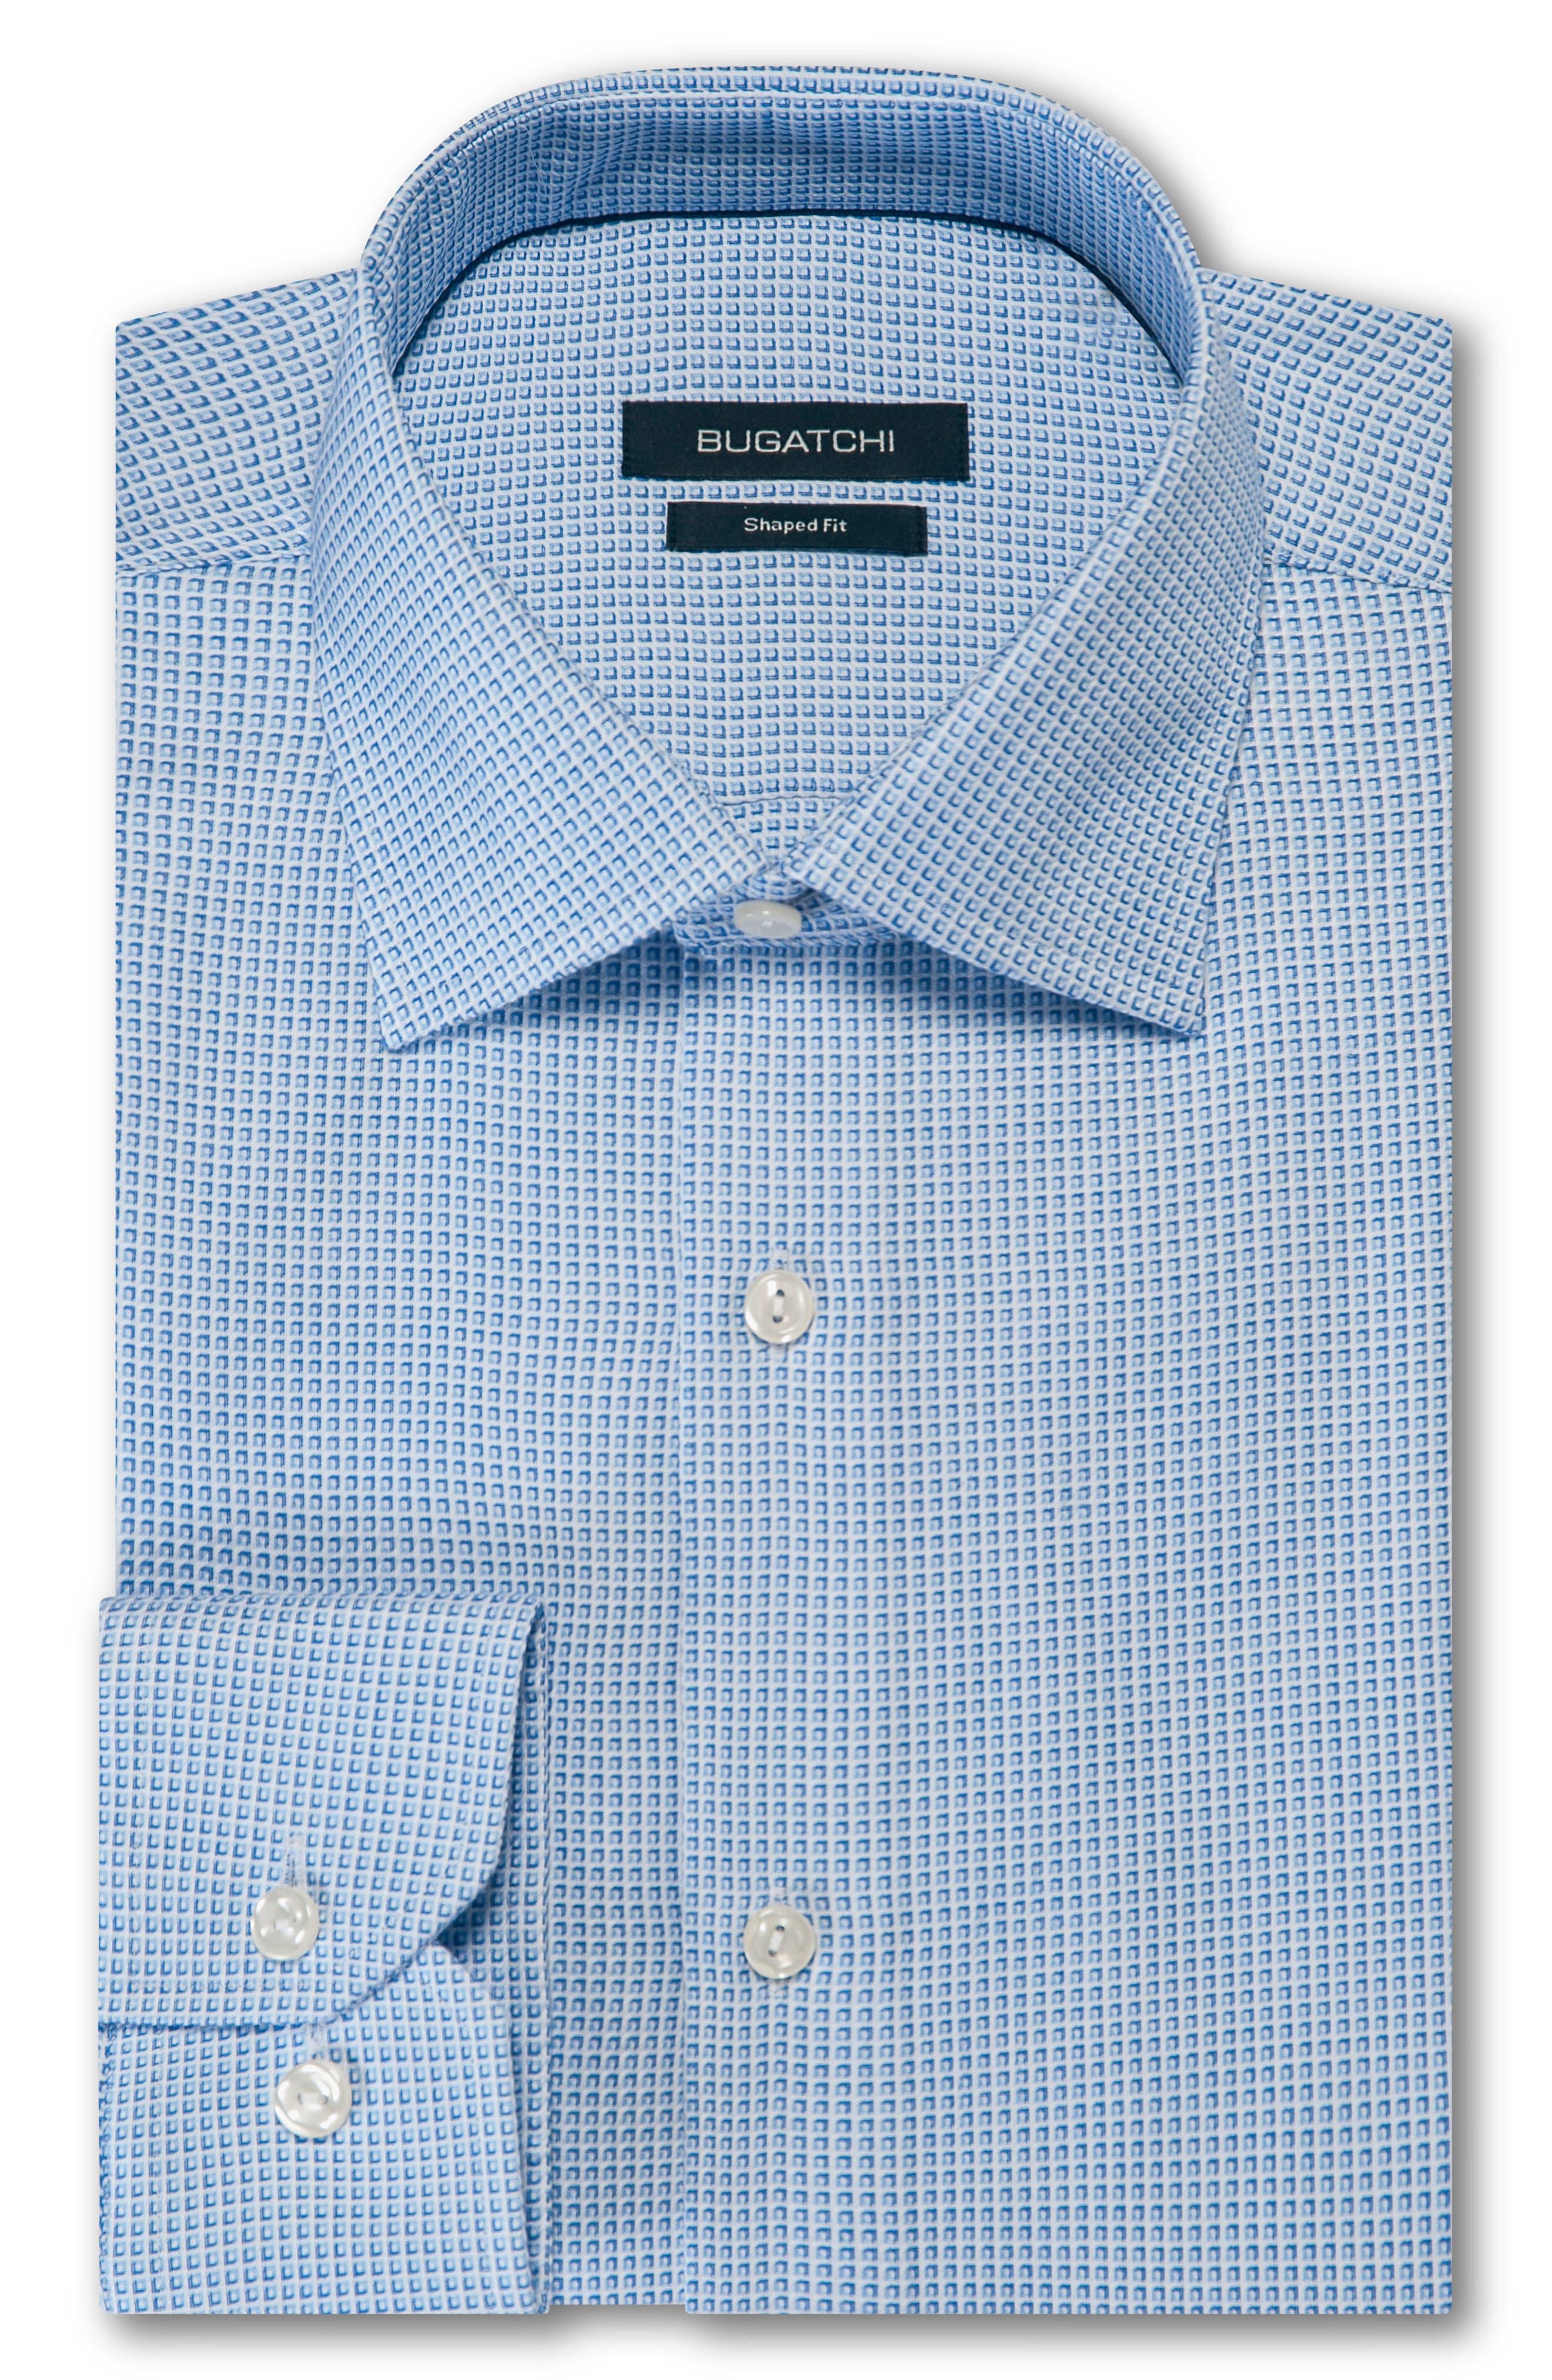 BUGATCHI Trim Fit Check Dress Shirt, Main, color, 459